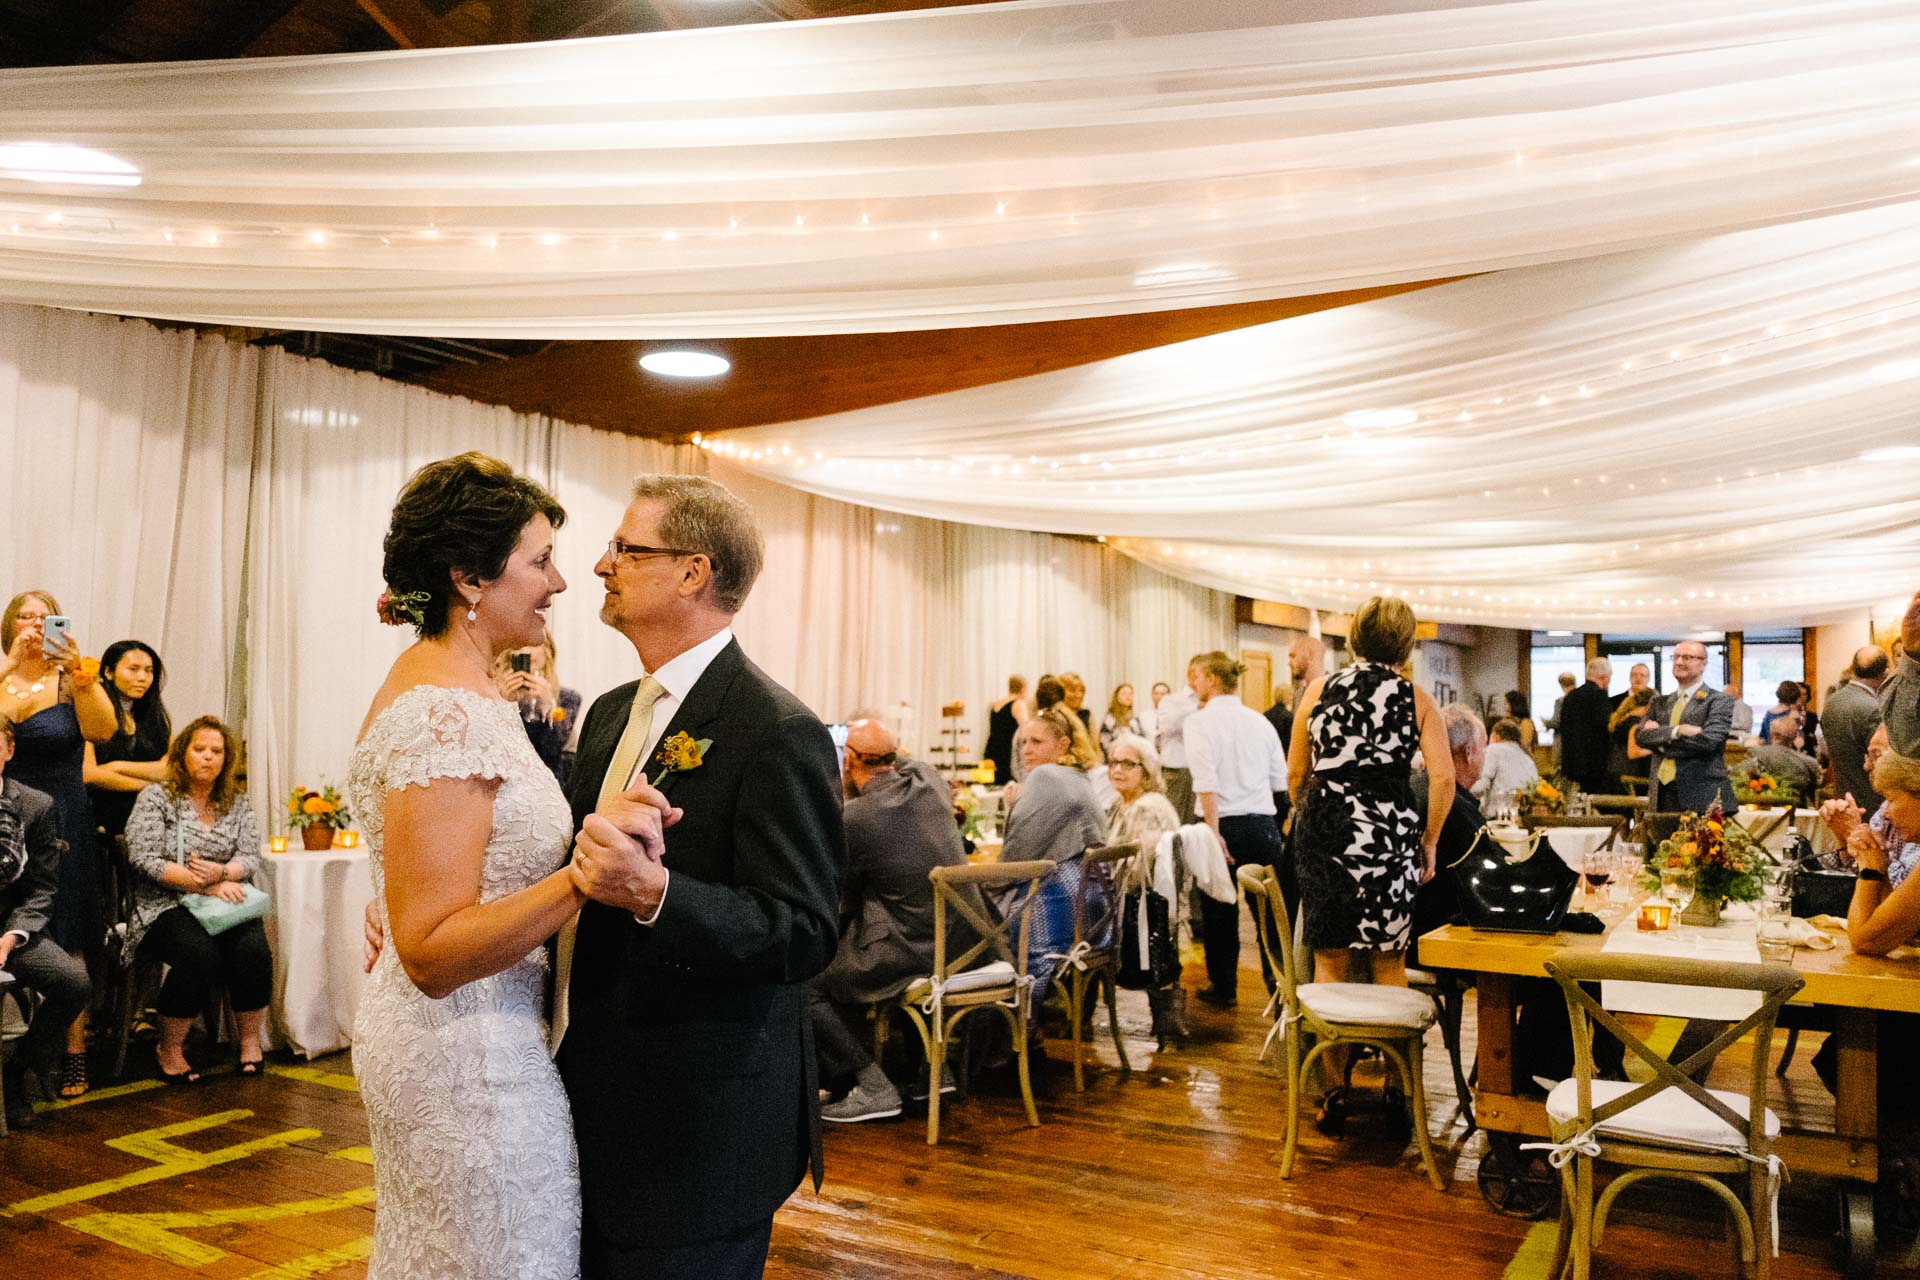 excelsior-wedding-photographer-pique-travel-design-ntm0023